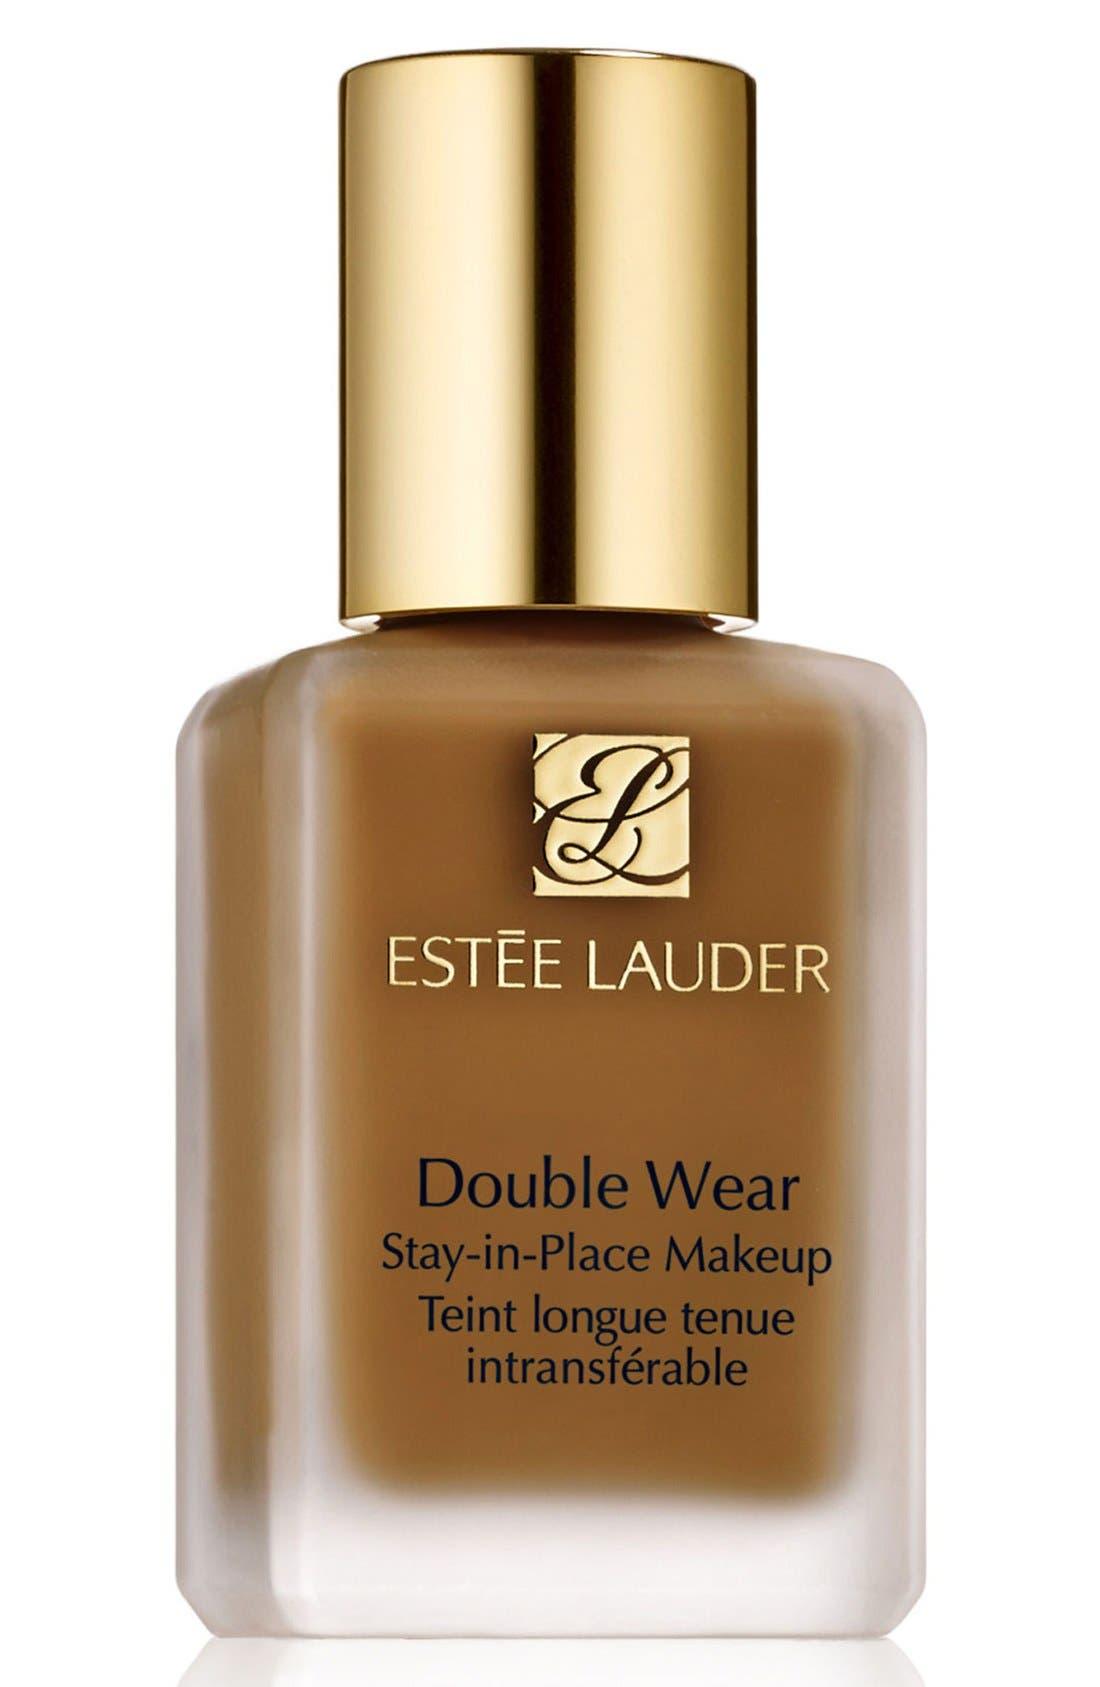 Estee Lauder Double Wear Stay-In-Place Liquid Makeup - 6N2 Truffle